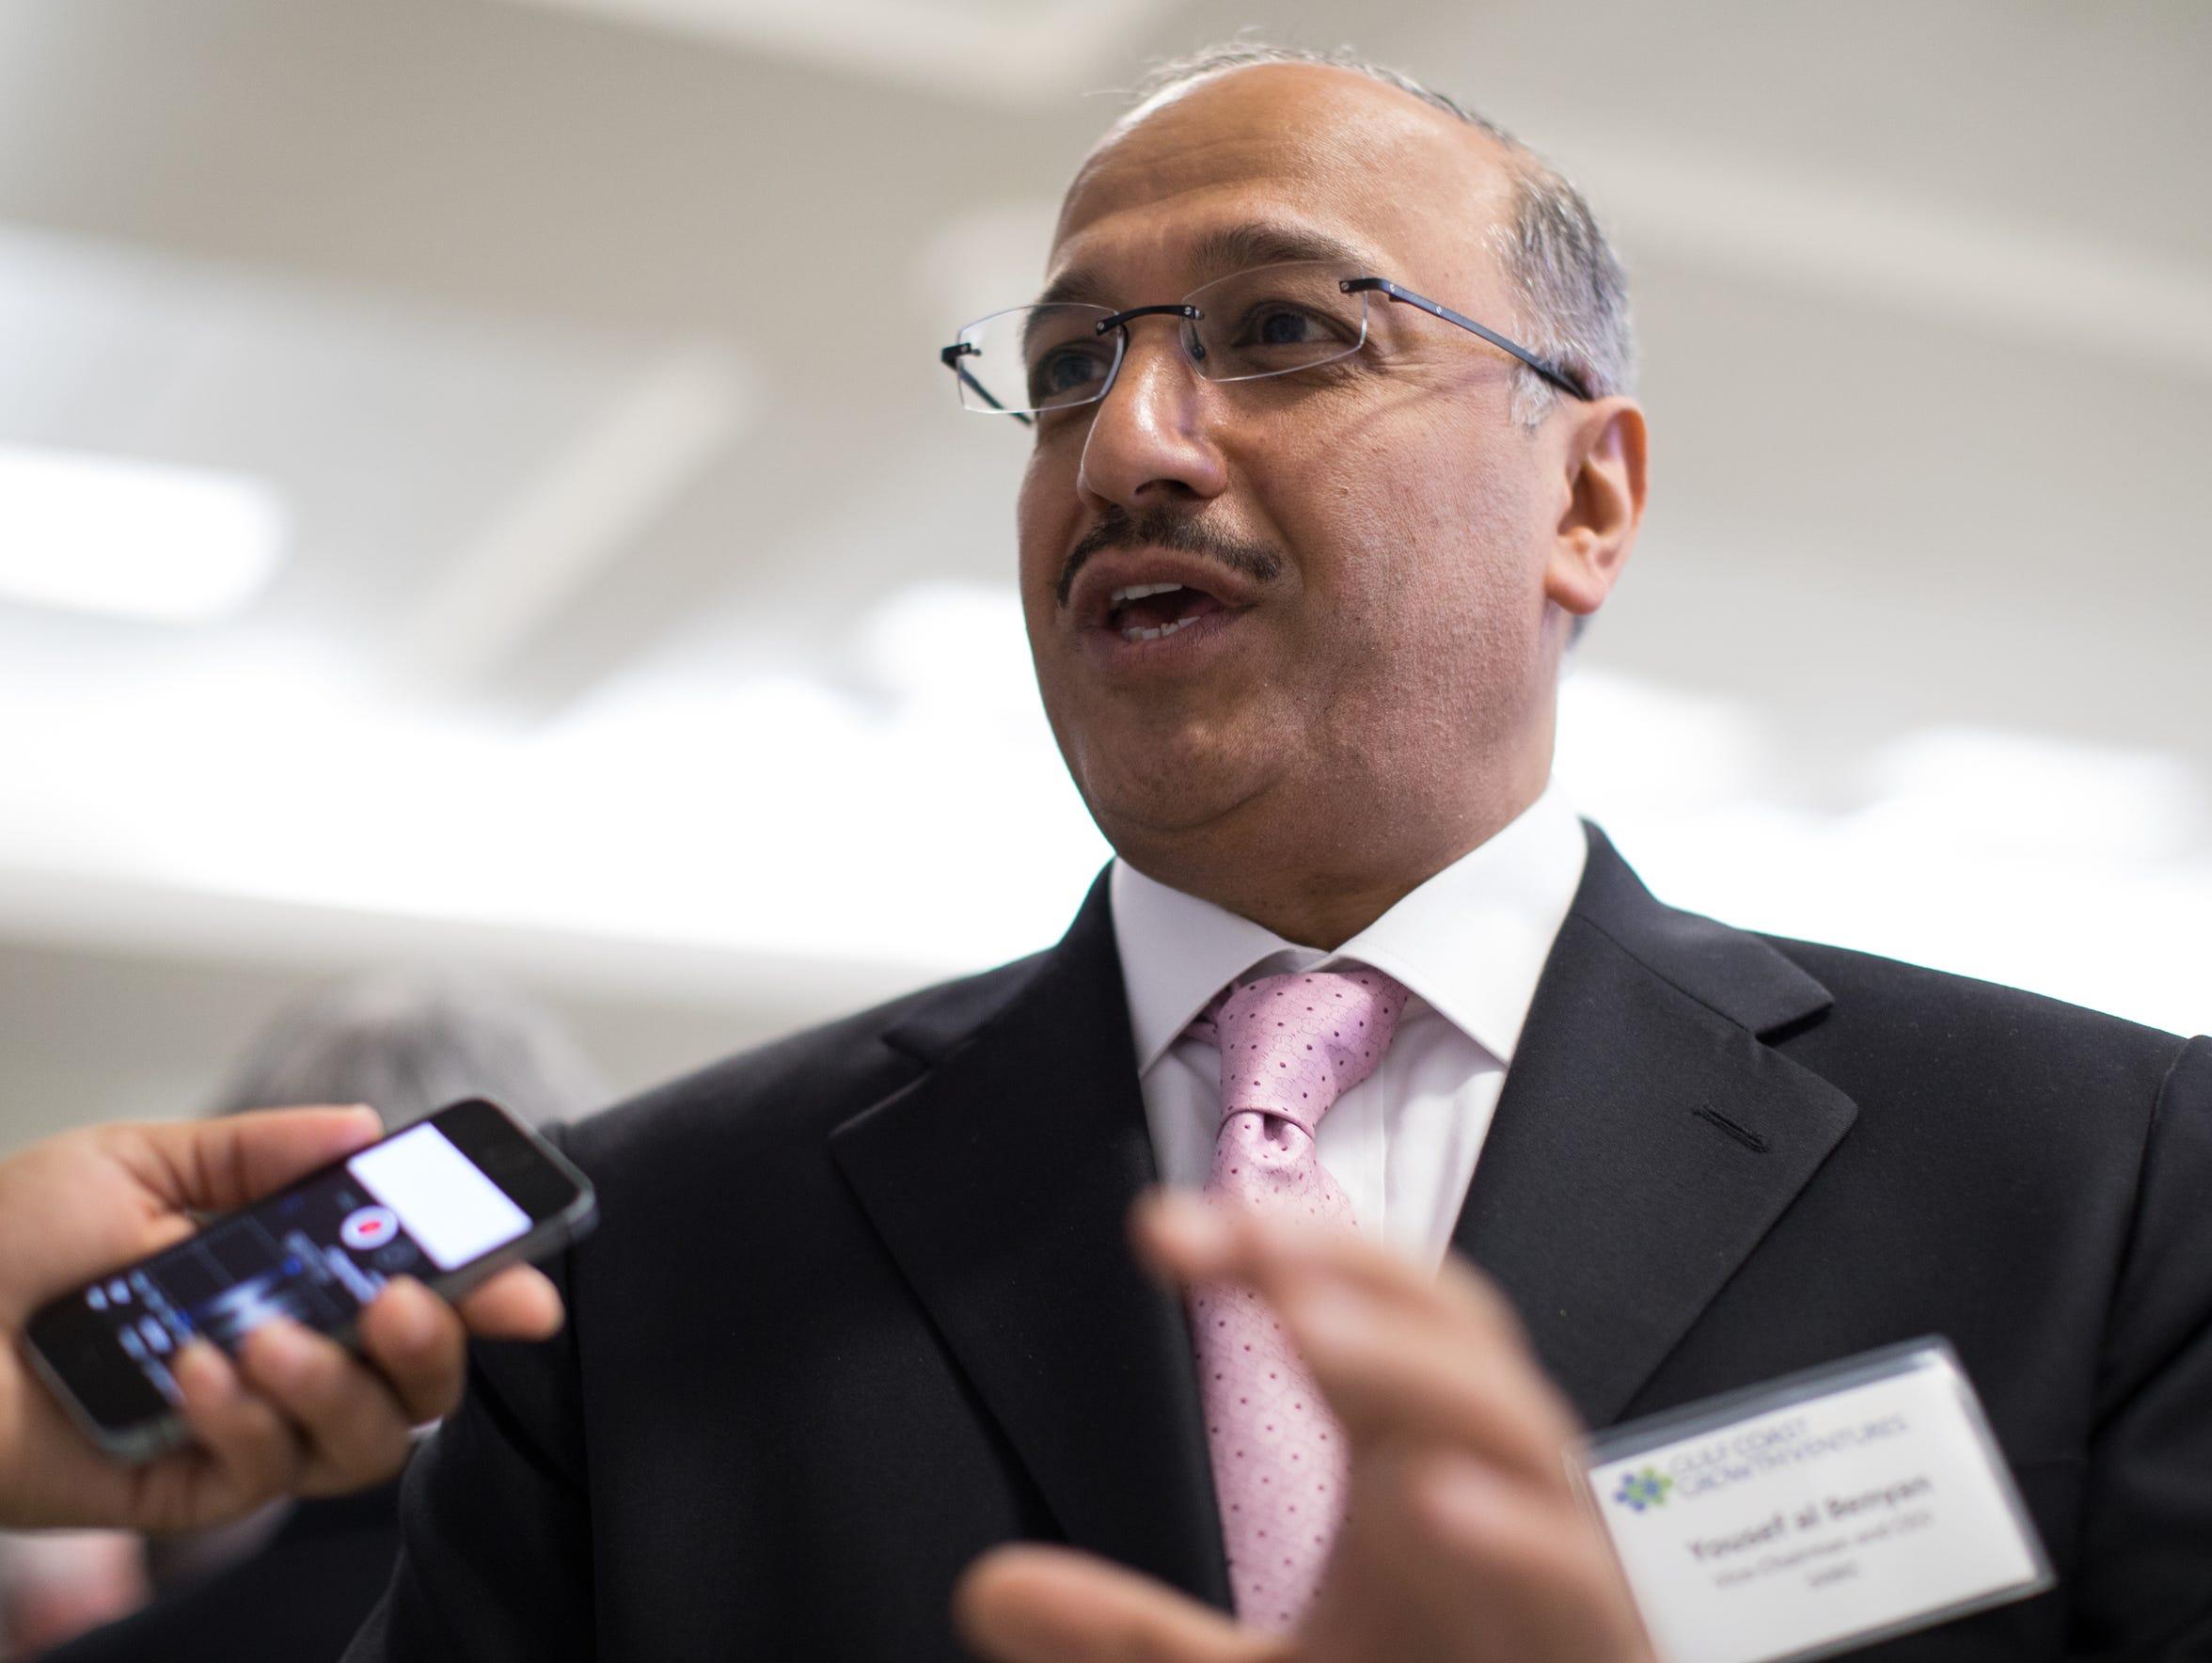 Vice Chairman and CEO of SABIC, Yousef Abdullah Al-Benyan